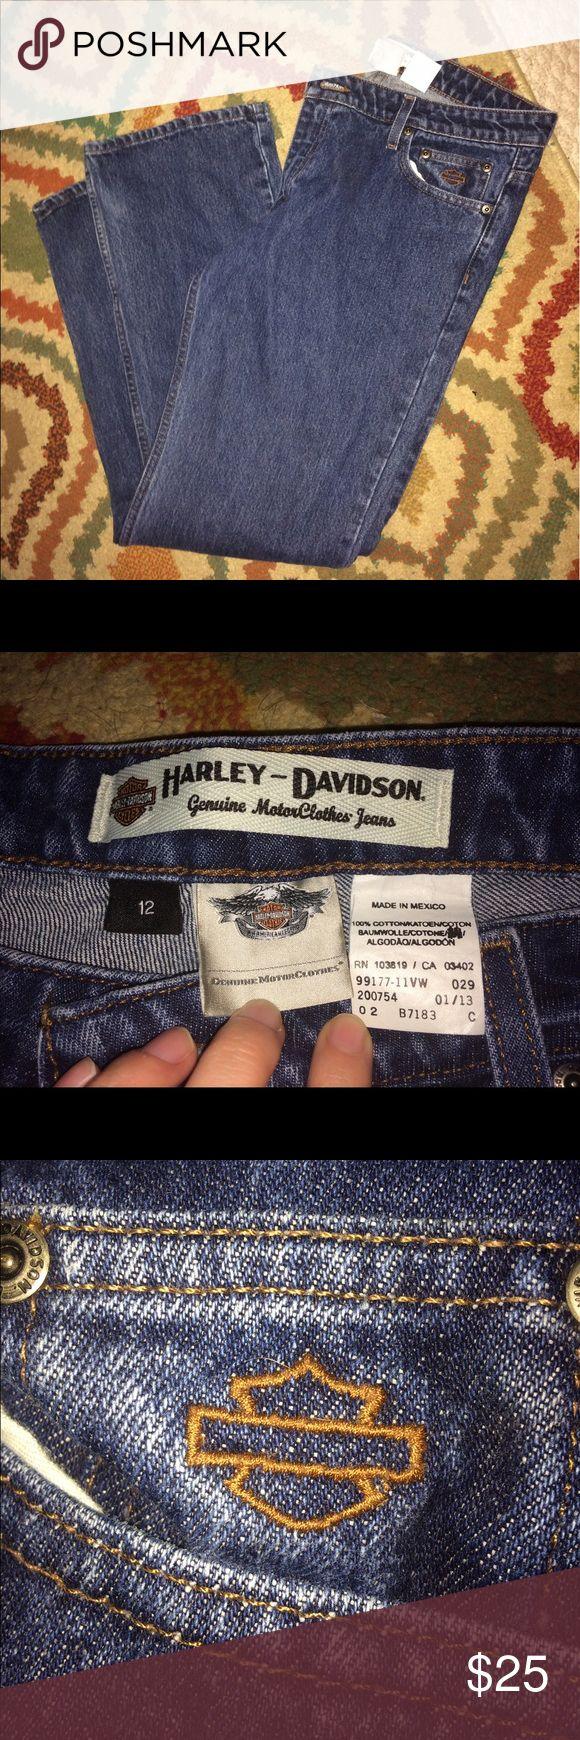 Harley-Davidson Jeans Authentic Harvey-Davidson jeans size 12. Never worn. Harley-Davidson Jeans